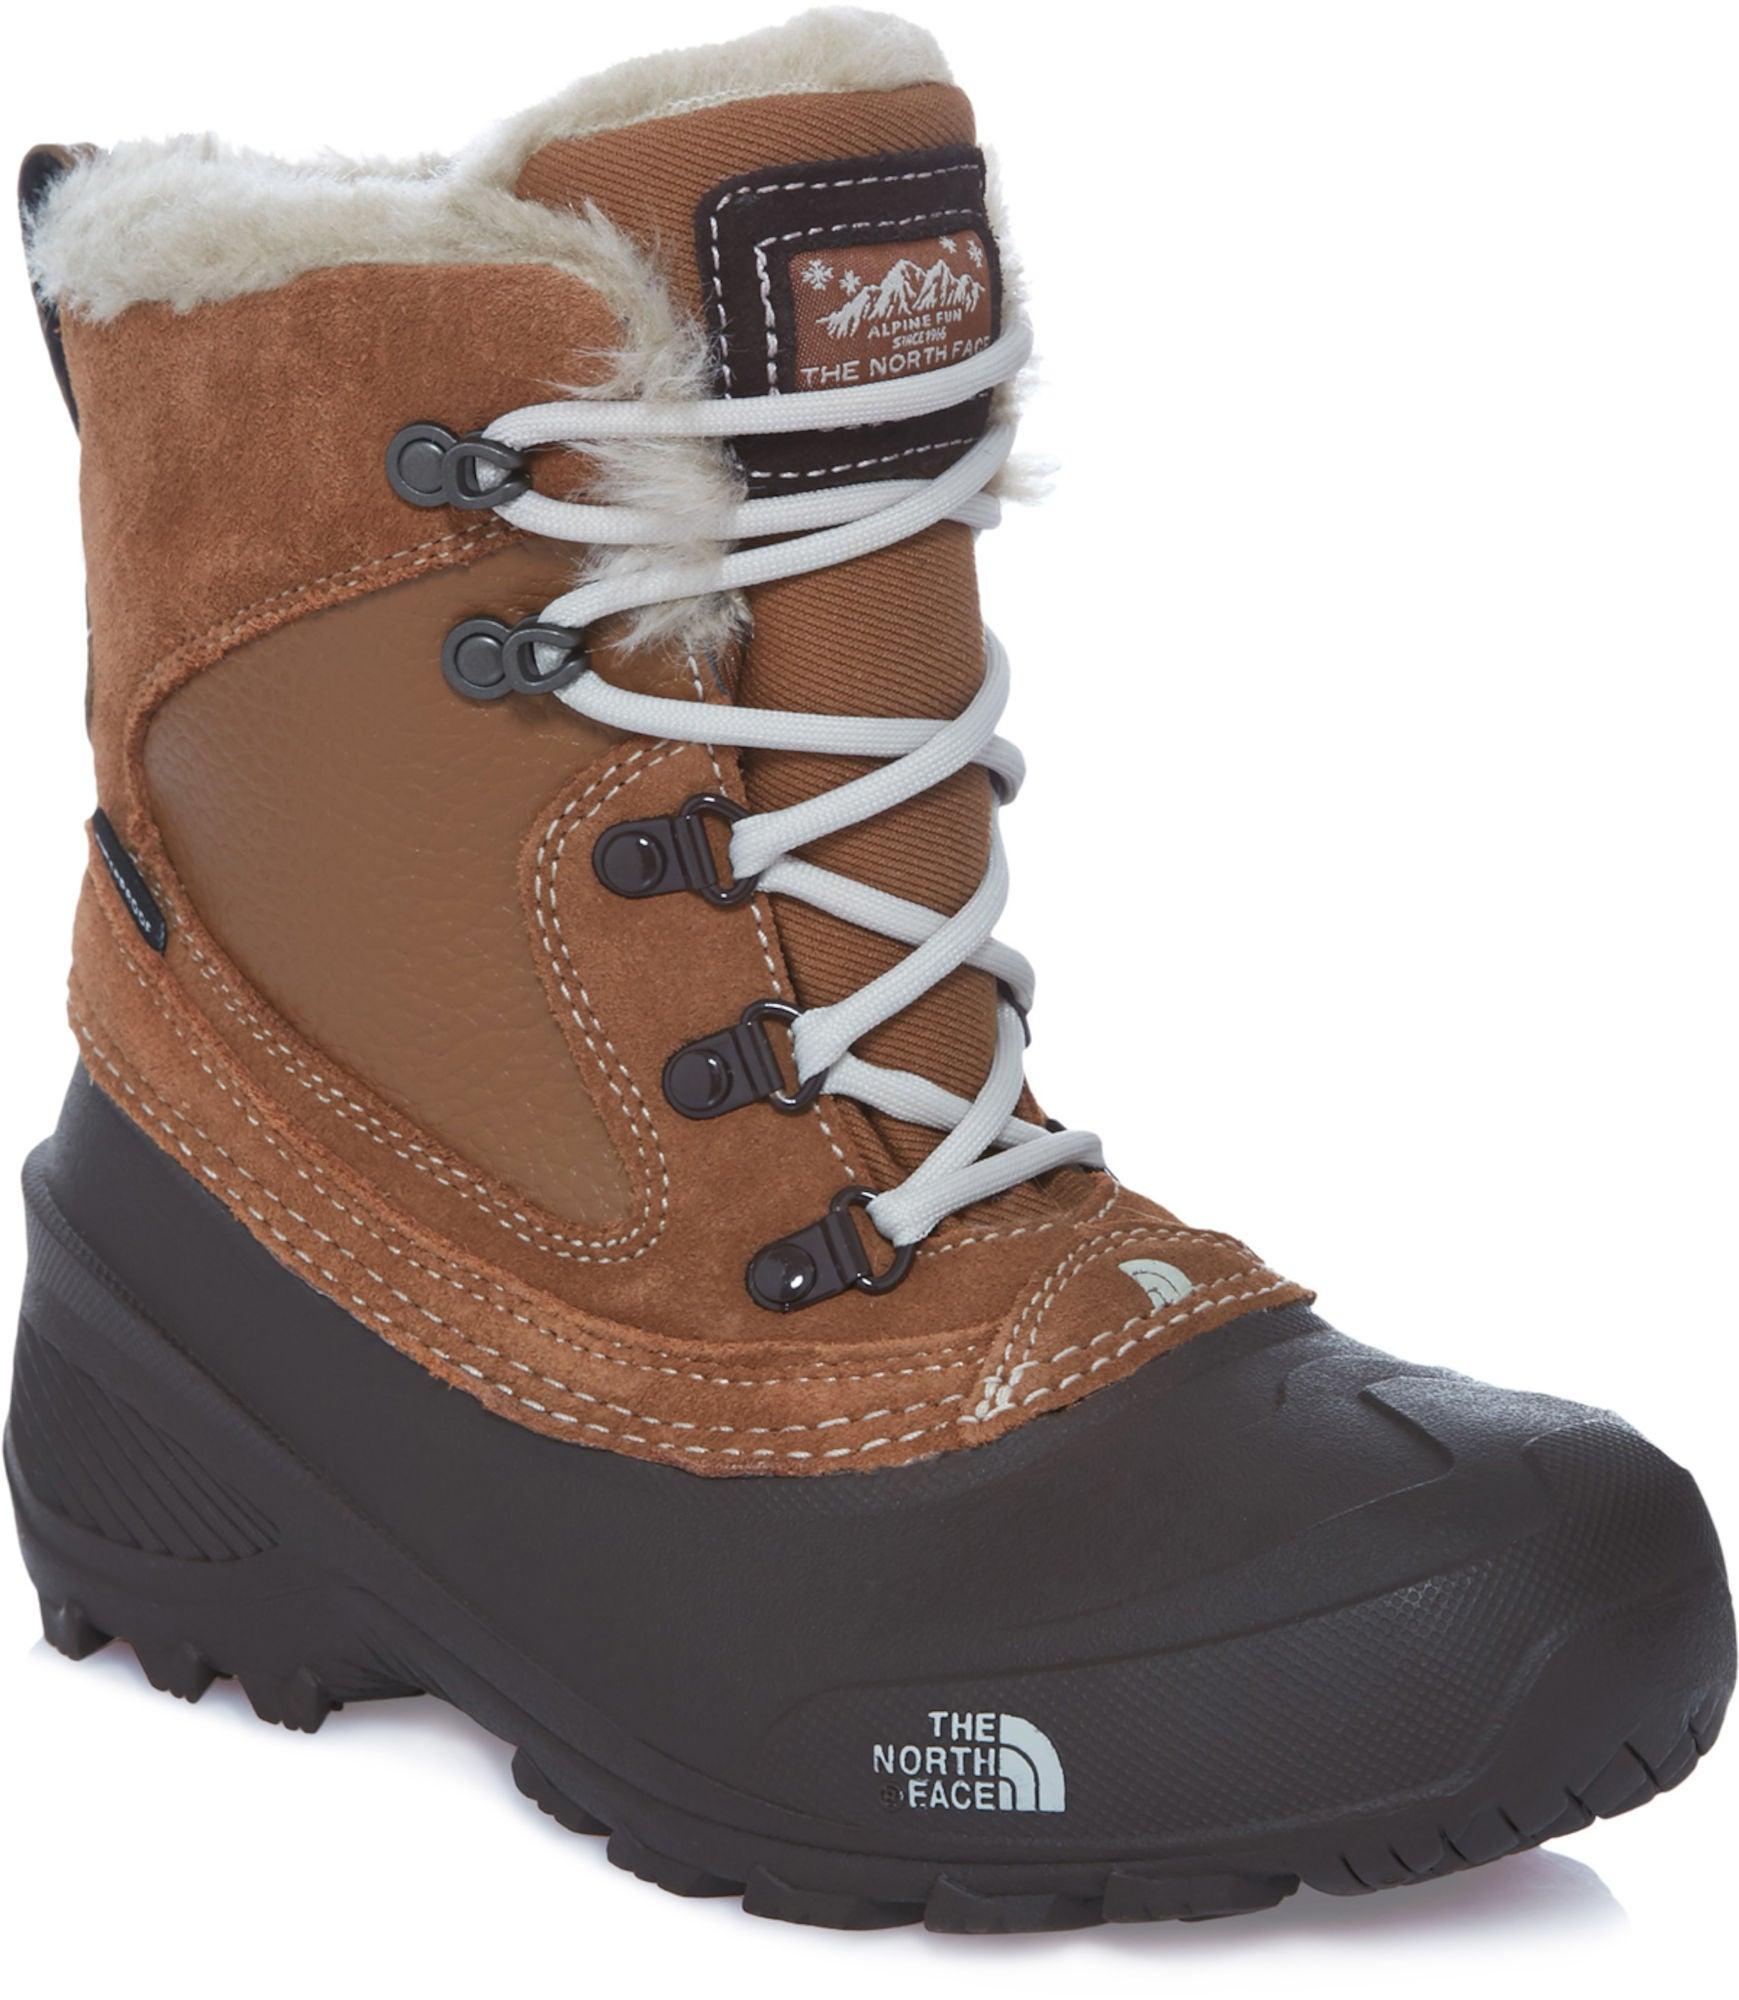 Kjøp The North Face Youth Shlista Extreme Vintersko, Brown